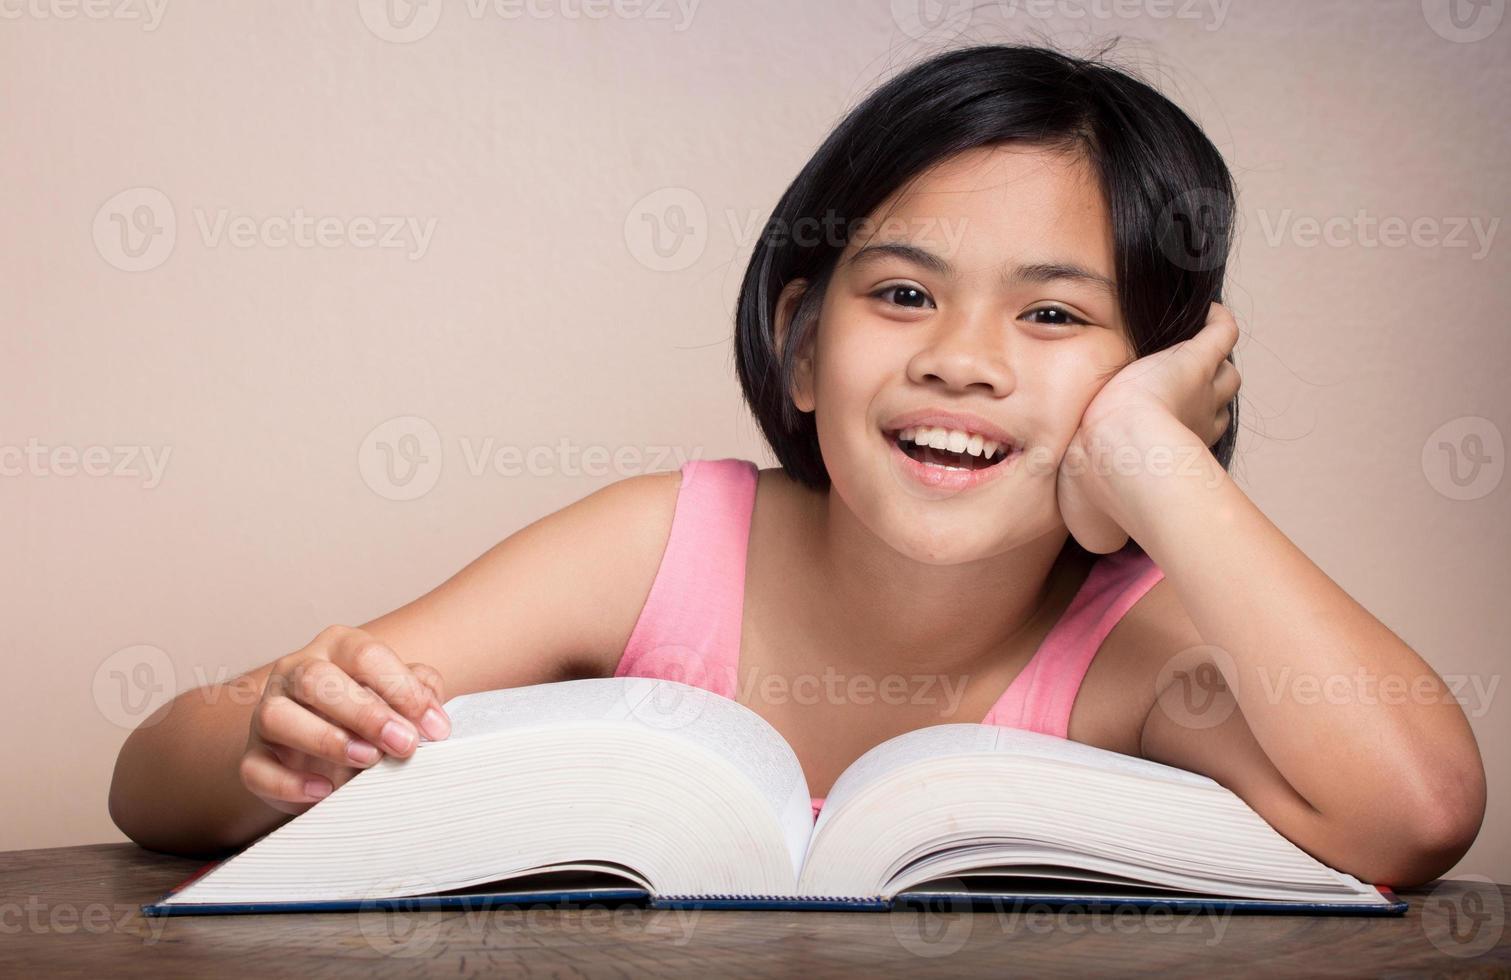 tjej som läser en stor bok foto